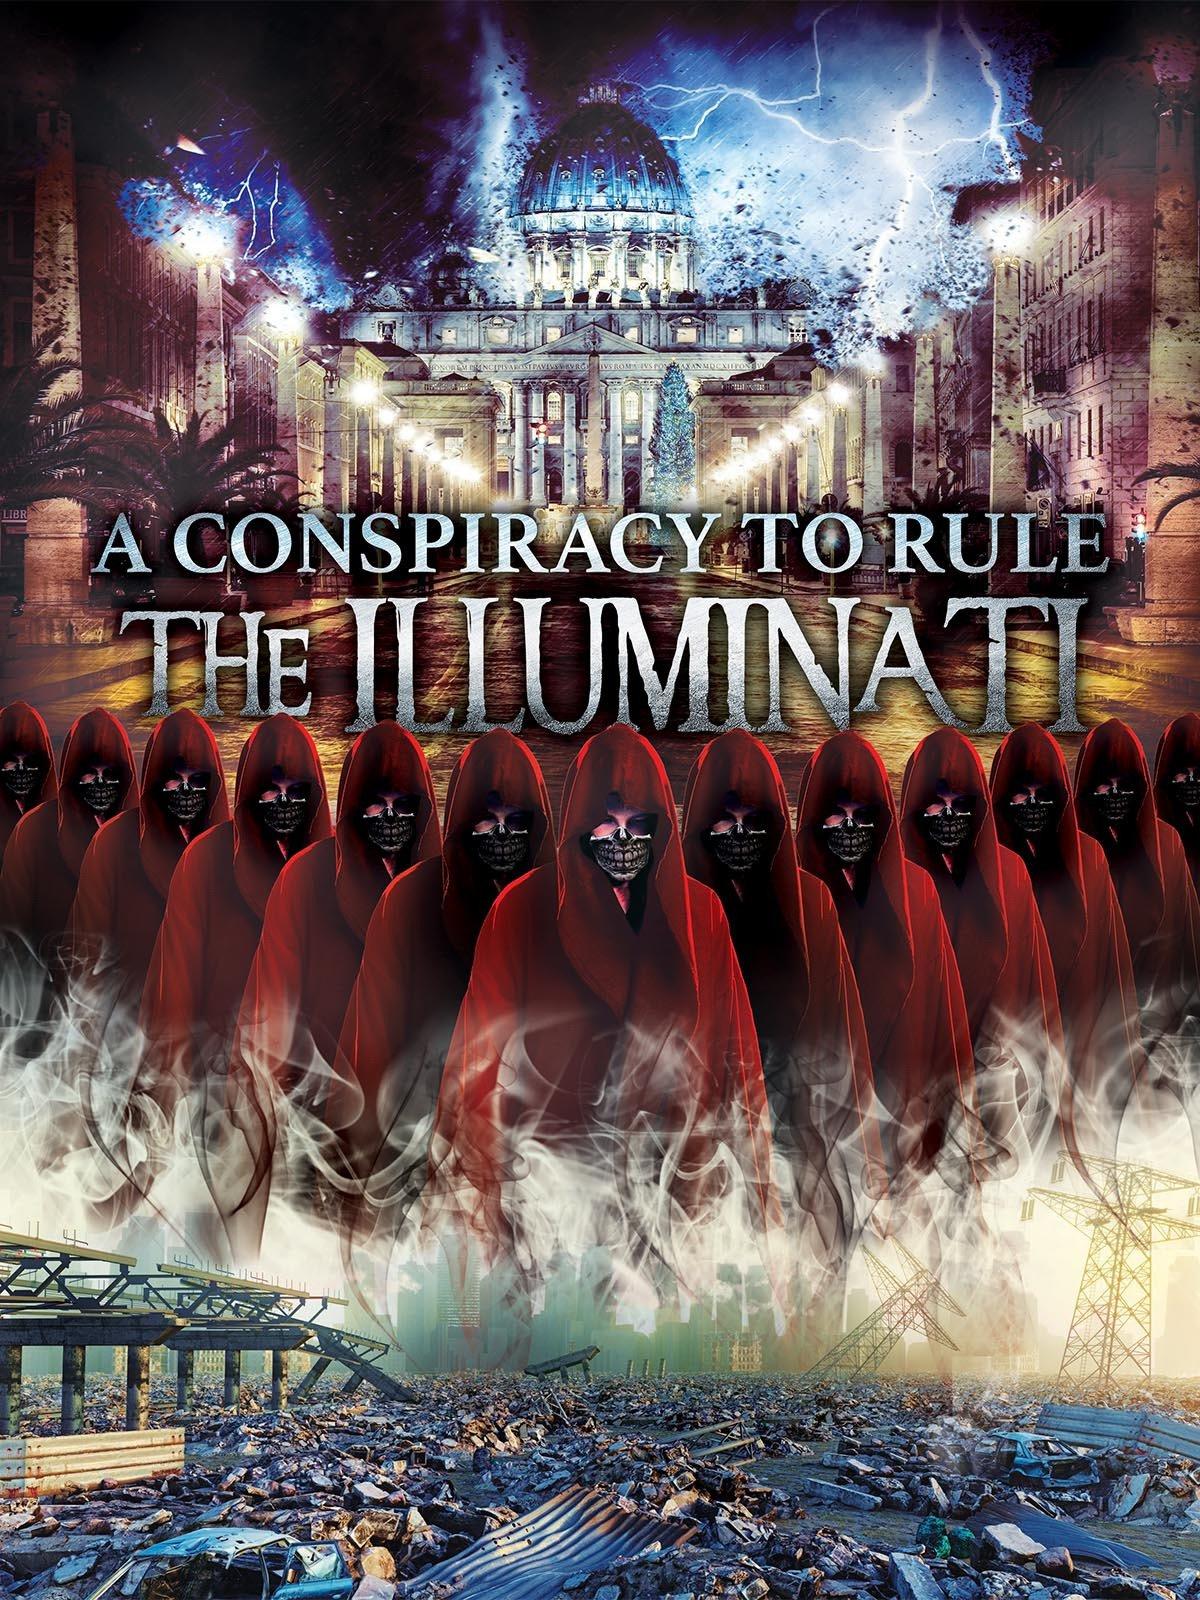 Conspiracy To Rule: The Illuminati, A on Amazon Prime Video UK